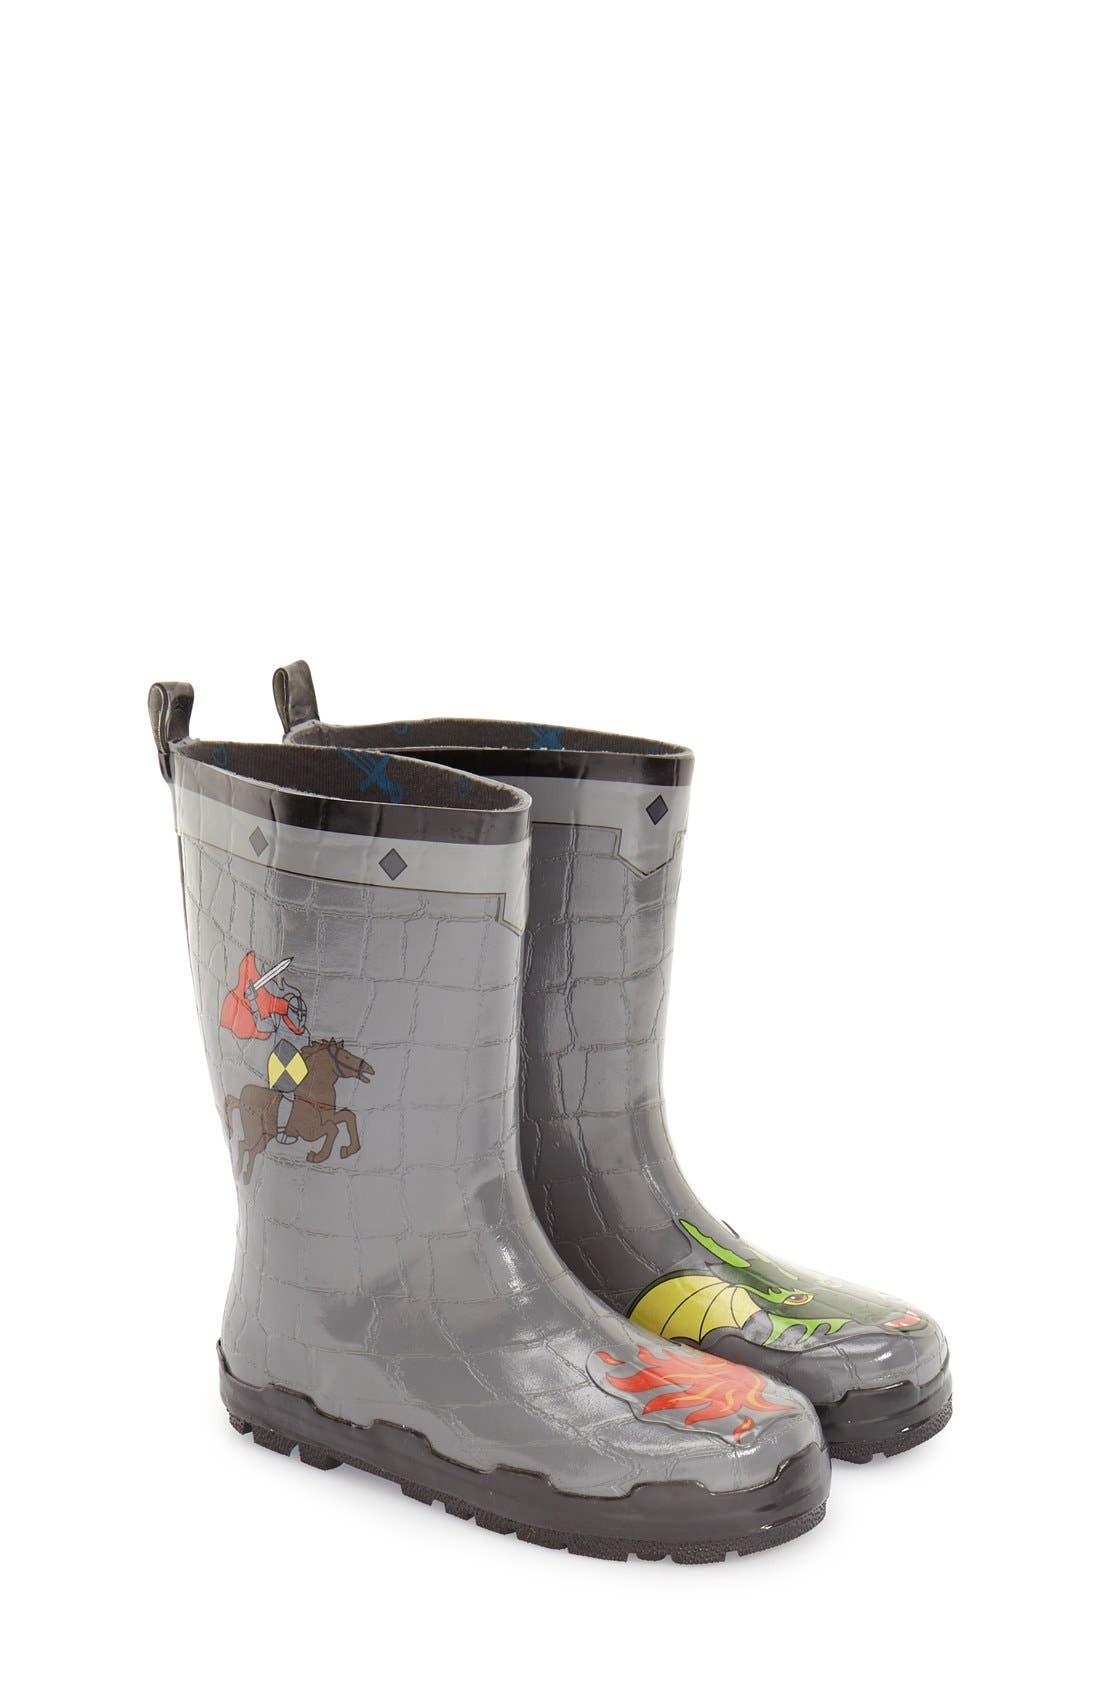 'Dragon Knight' Waterproof Rain Boot,                             Main thumbnail 1, color,                             020